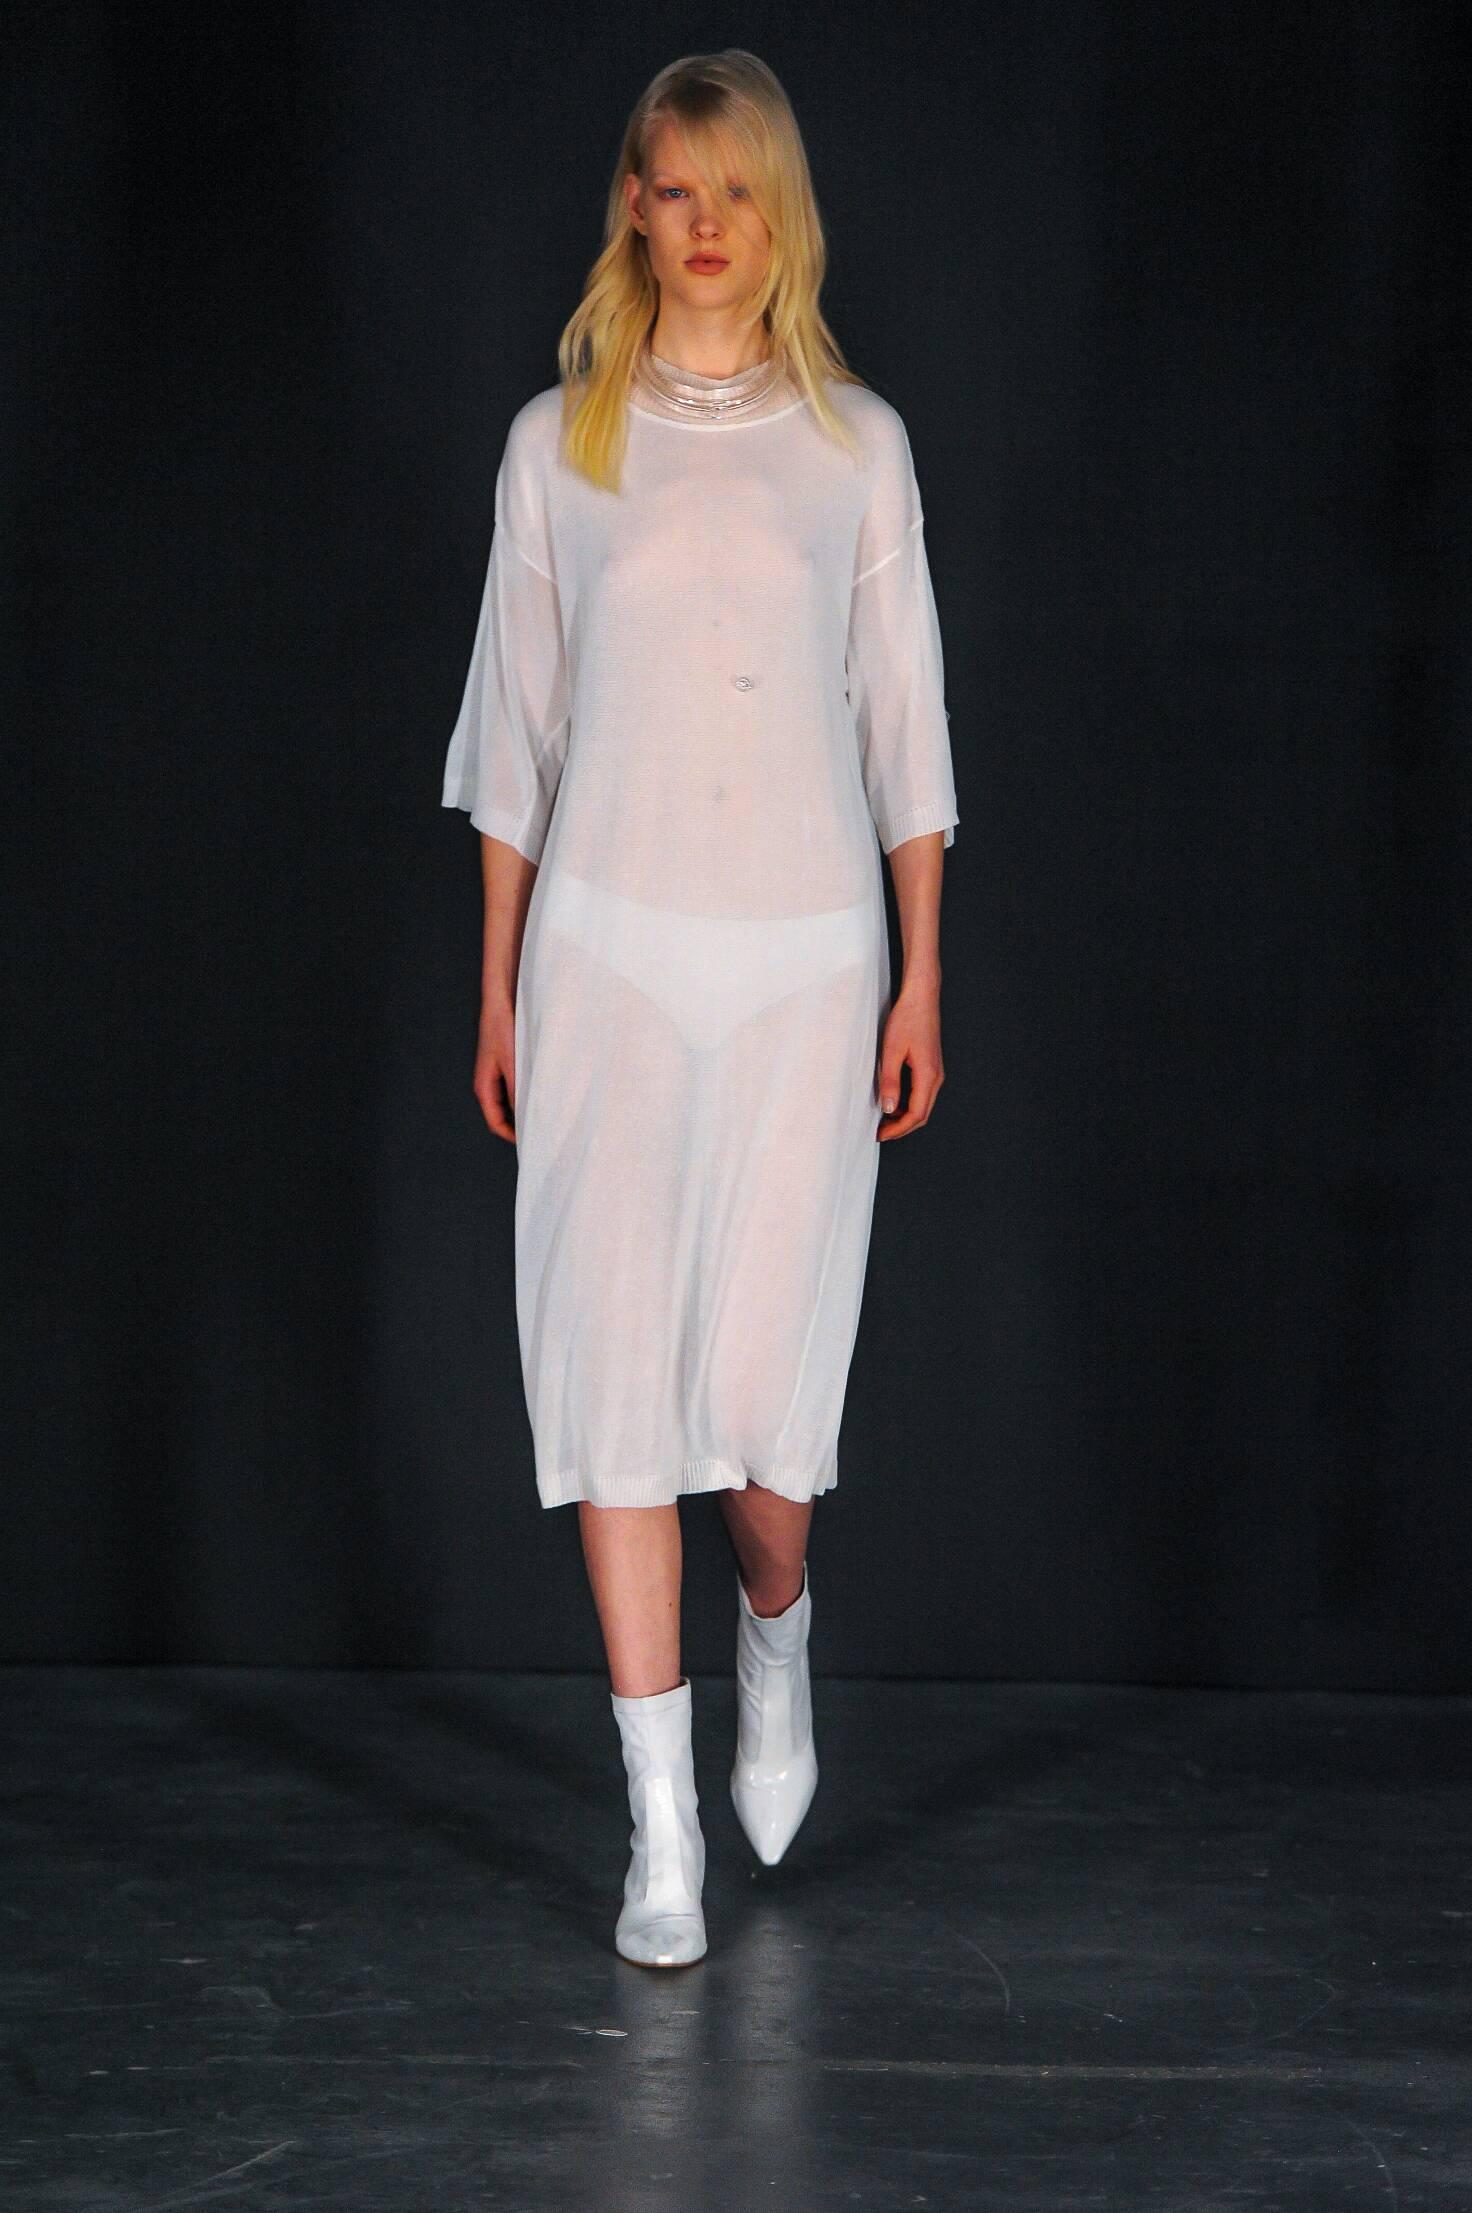 Fashion Man Model Thomas Tait Collection Catwalk